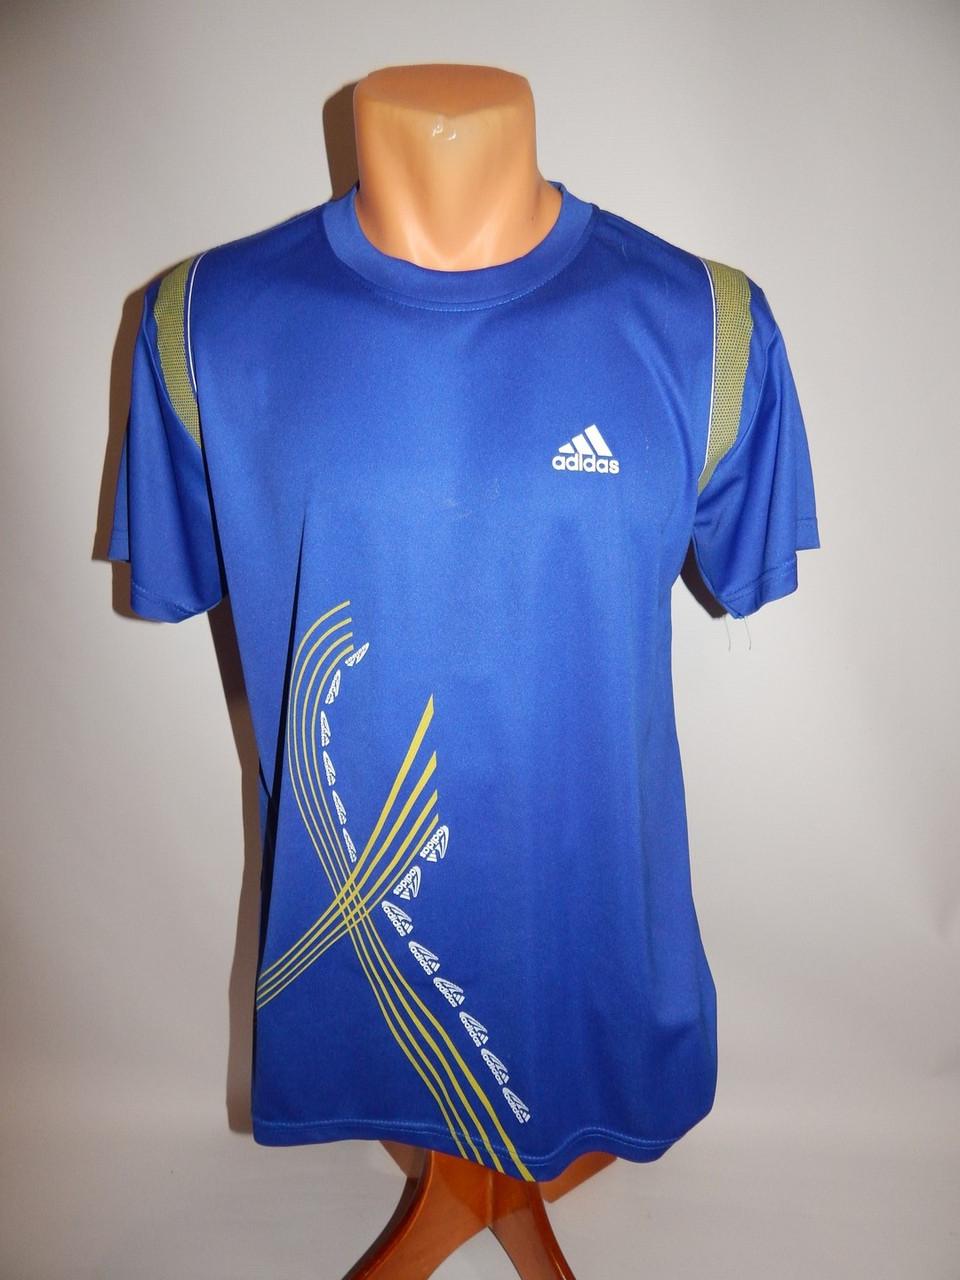 a829ca9bf9a Мужская спортивная футболка Adidas реплика р.48 026Ф   продажа